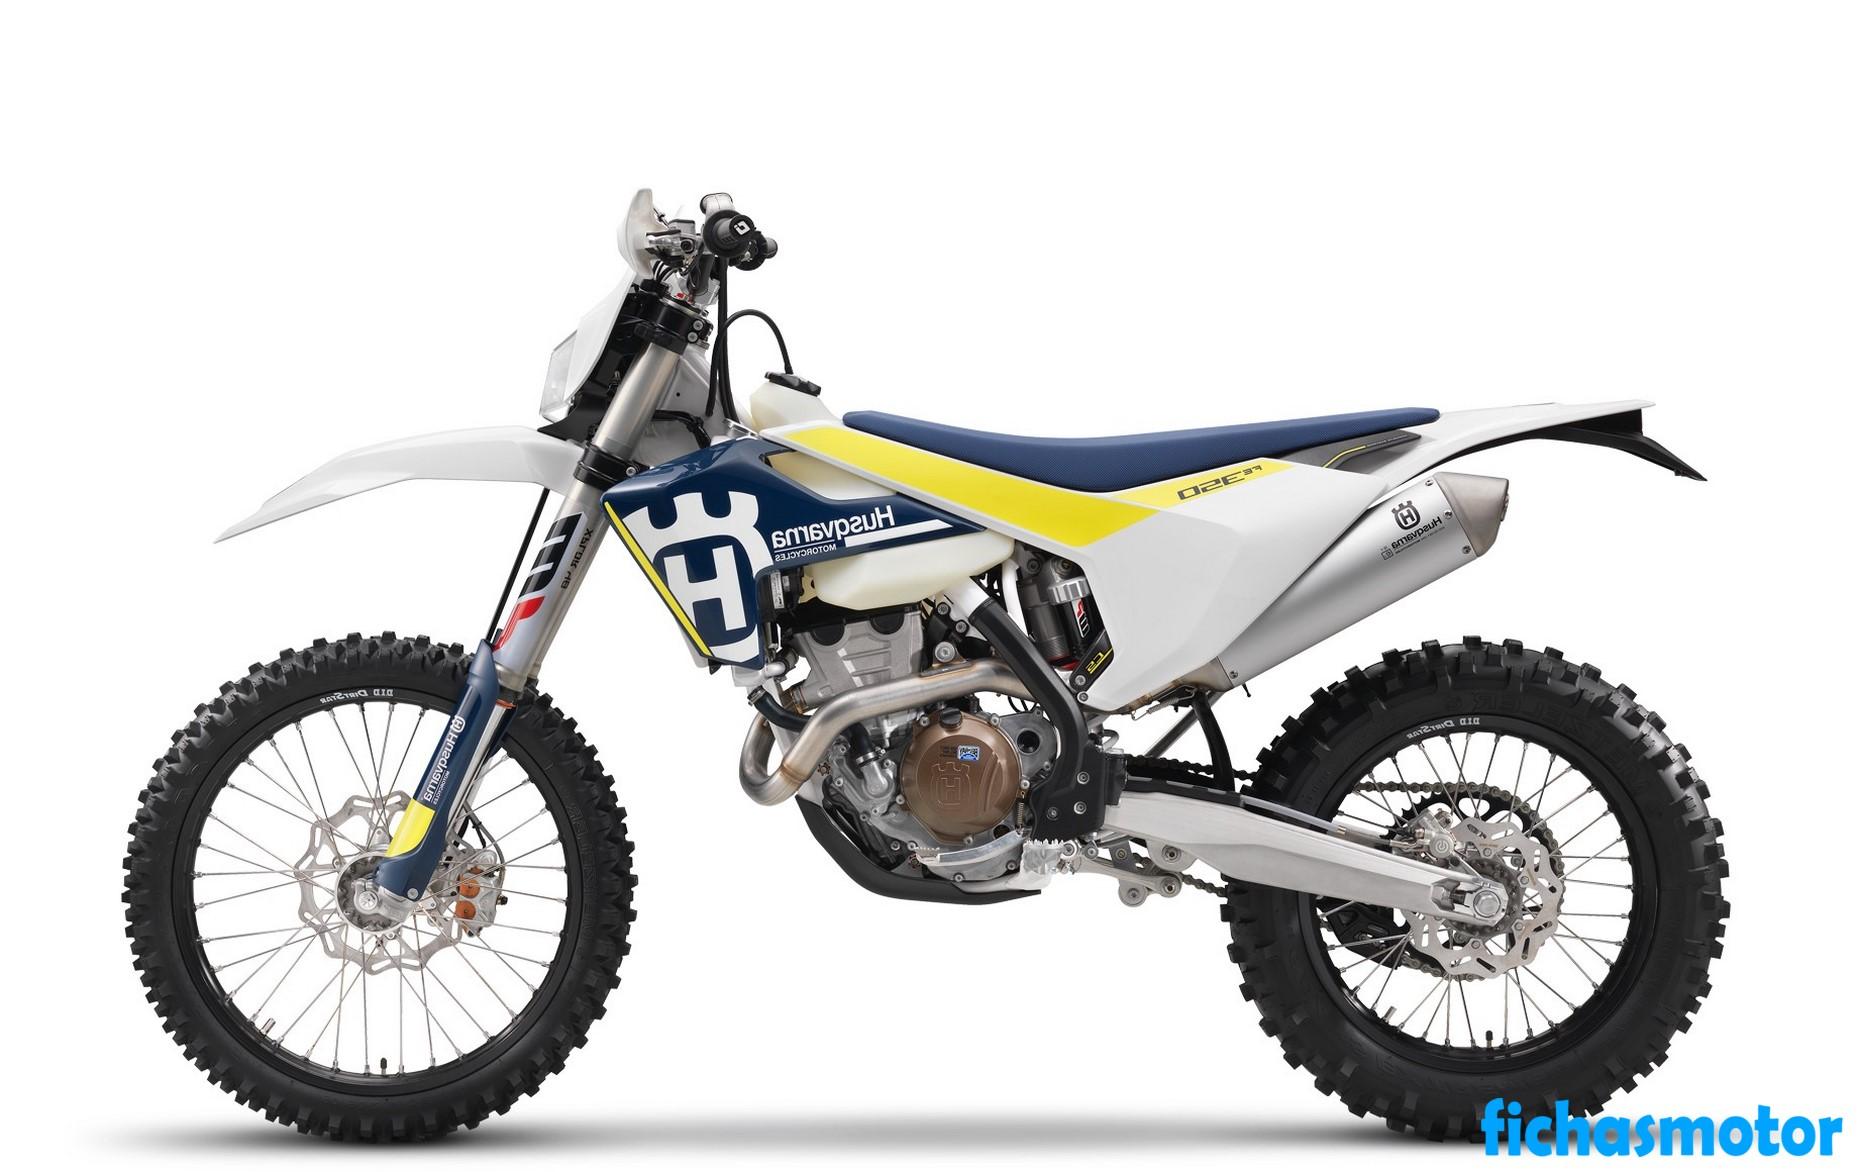 Ficha técnica Husqvarna FE 350 2020